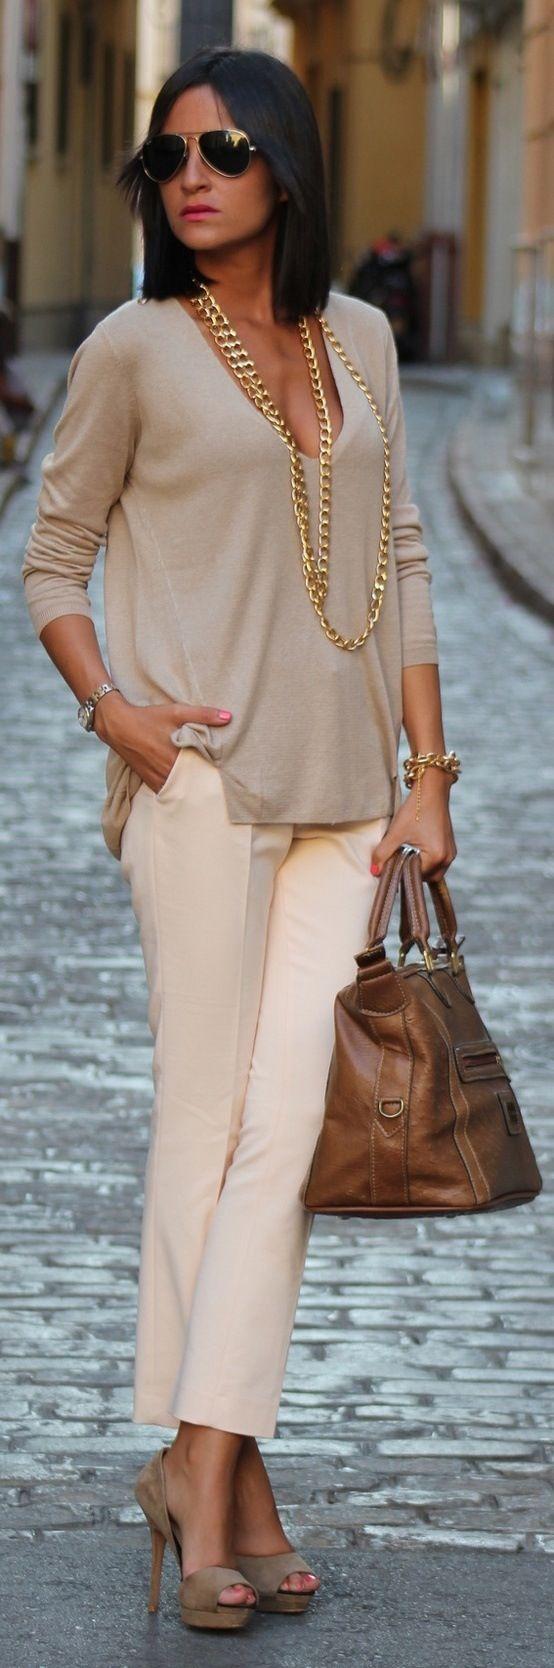 best White Summer images on Pinterest My style Beachwear